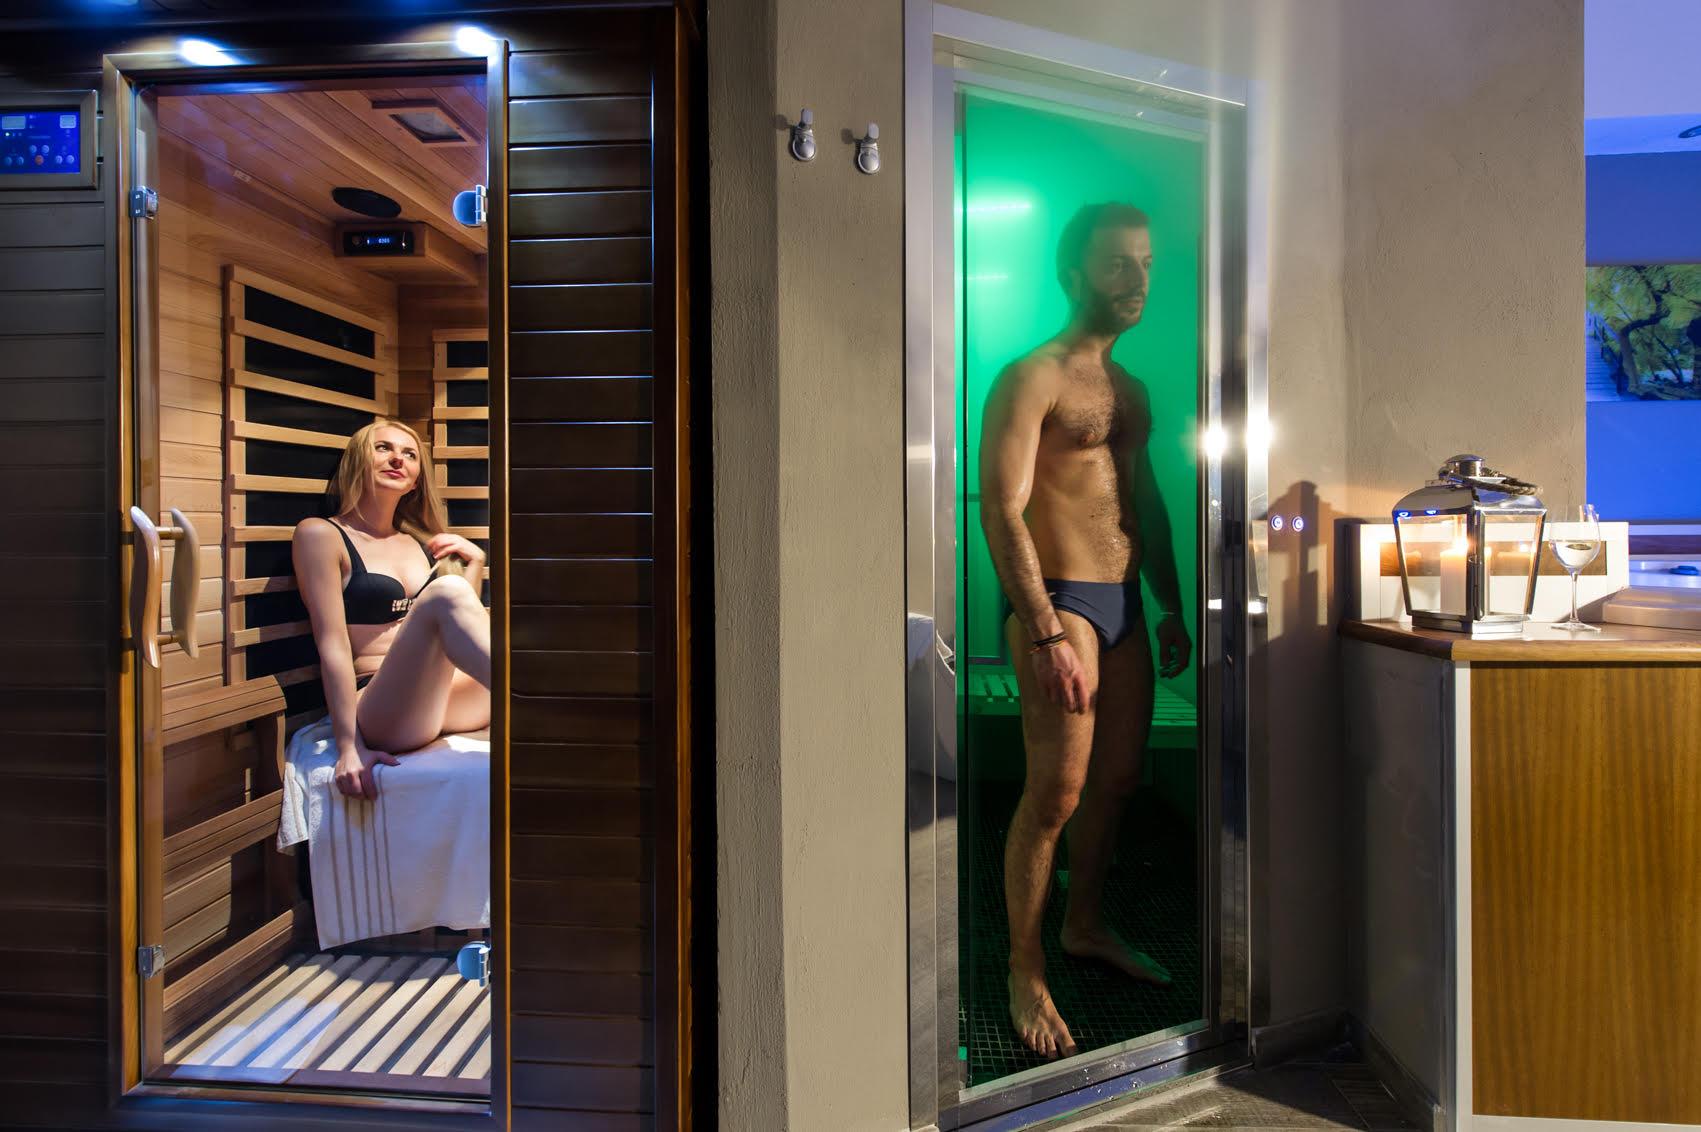 Bagno turco brunelleschi luxury holidays roma - Benefici bagno turco ...